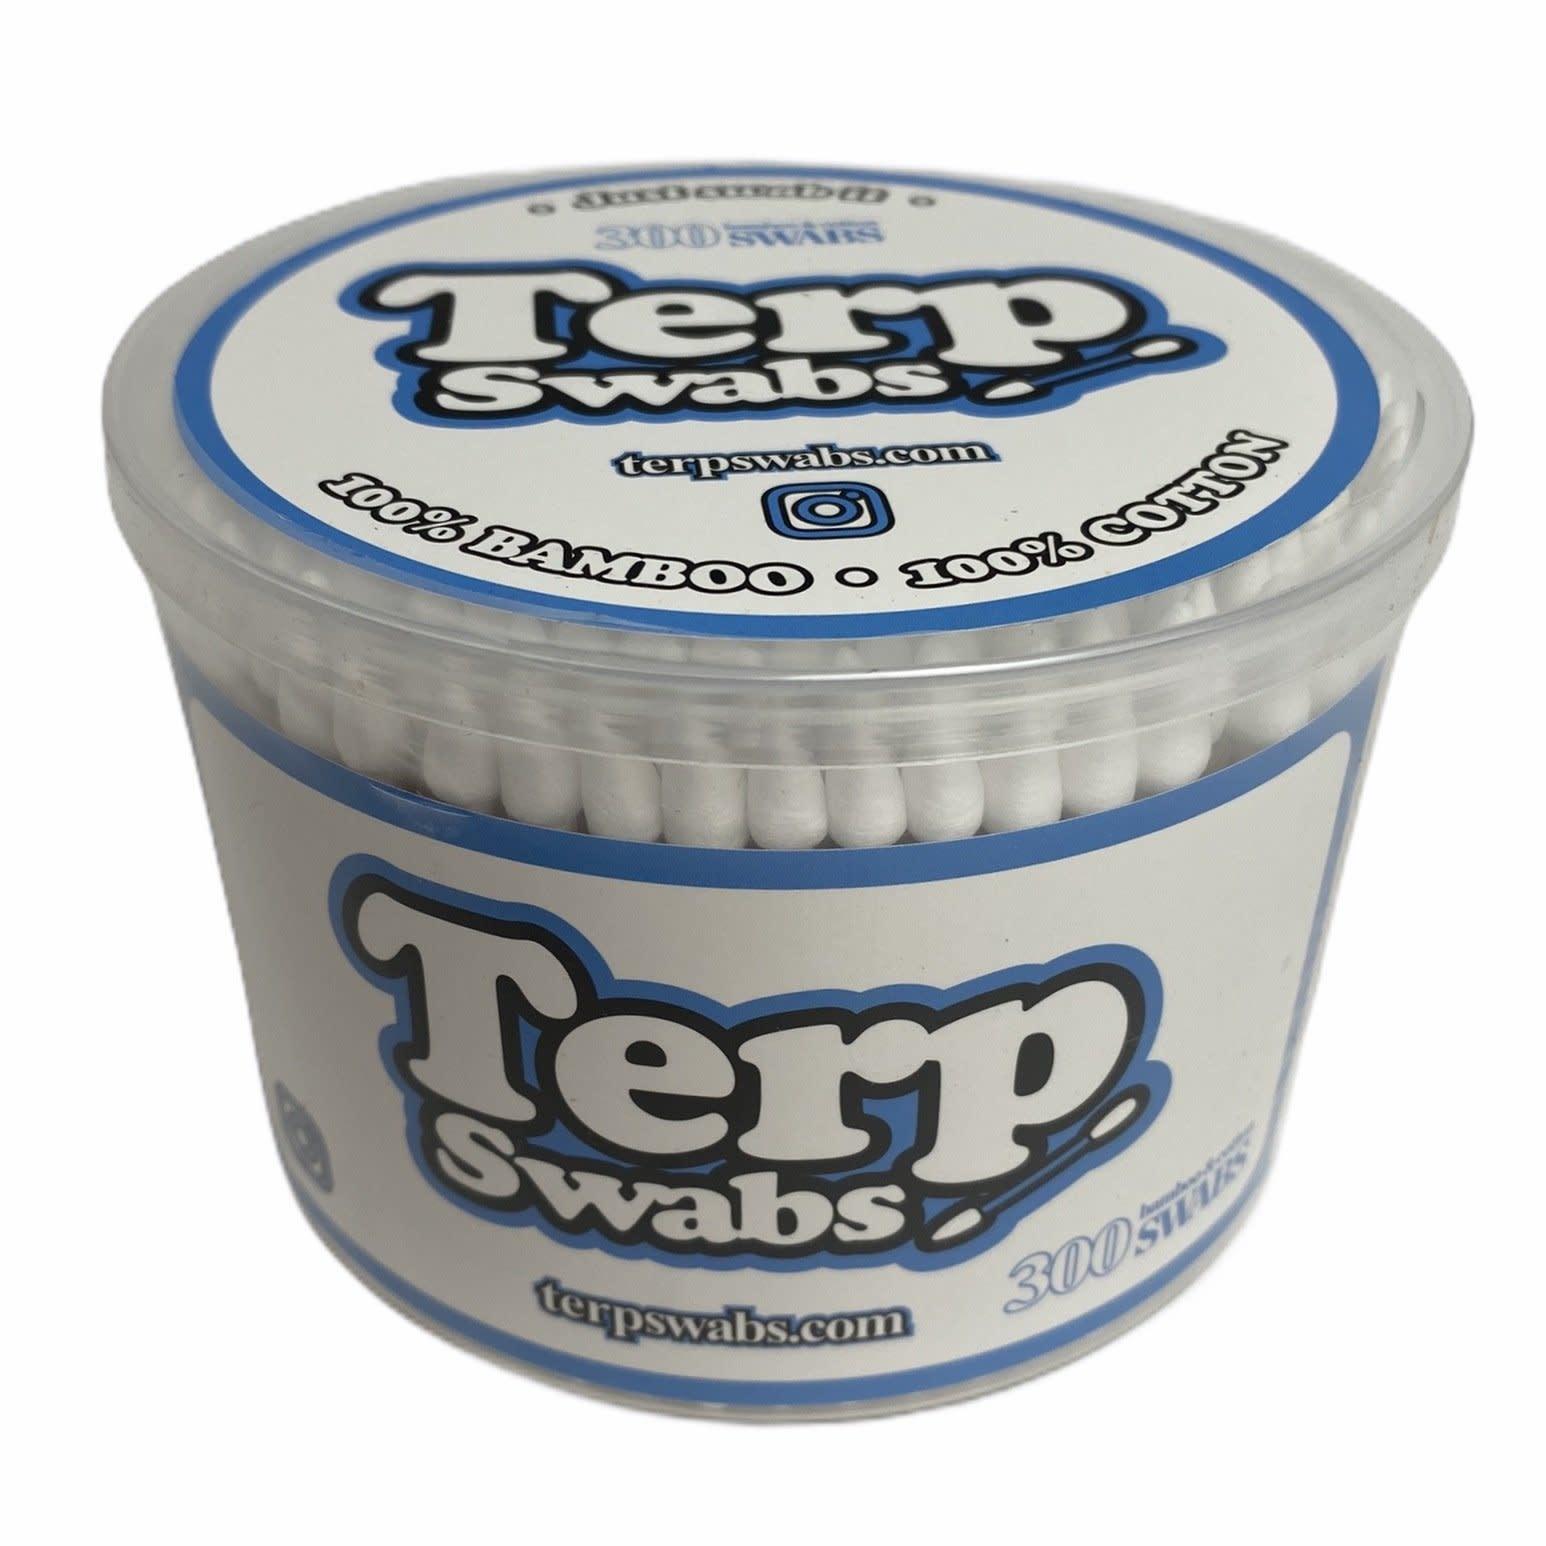 Terp Swabs